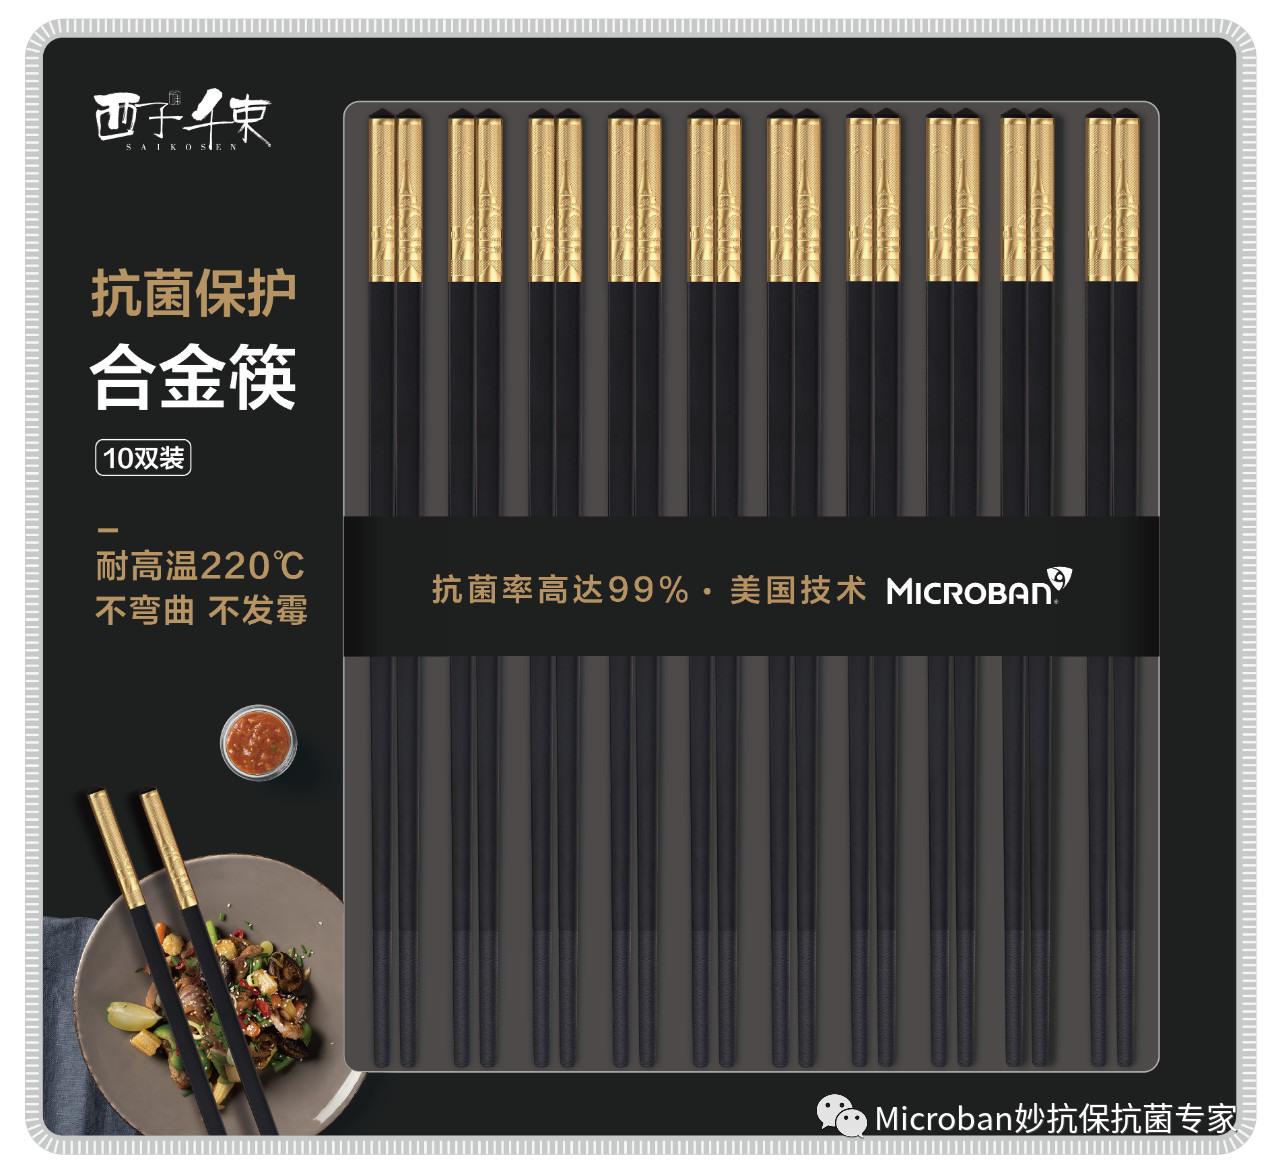 Suncha Chopsticks